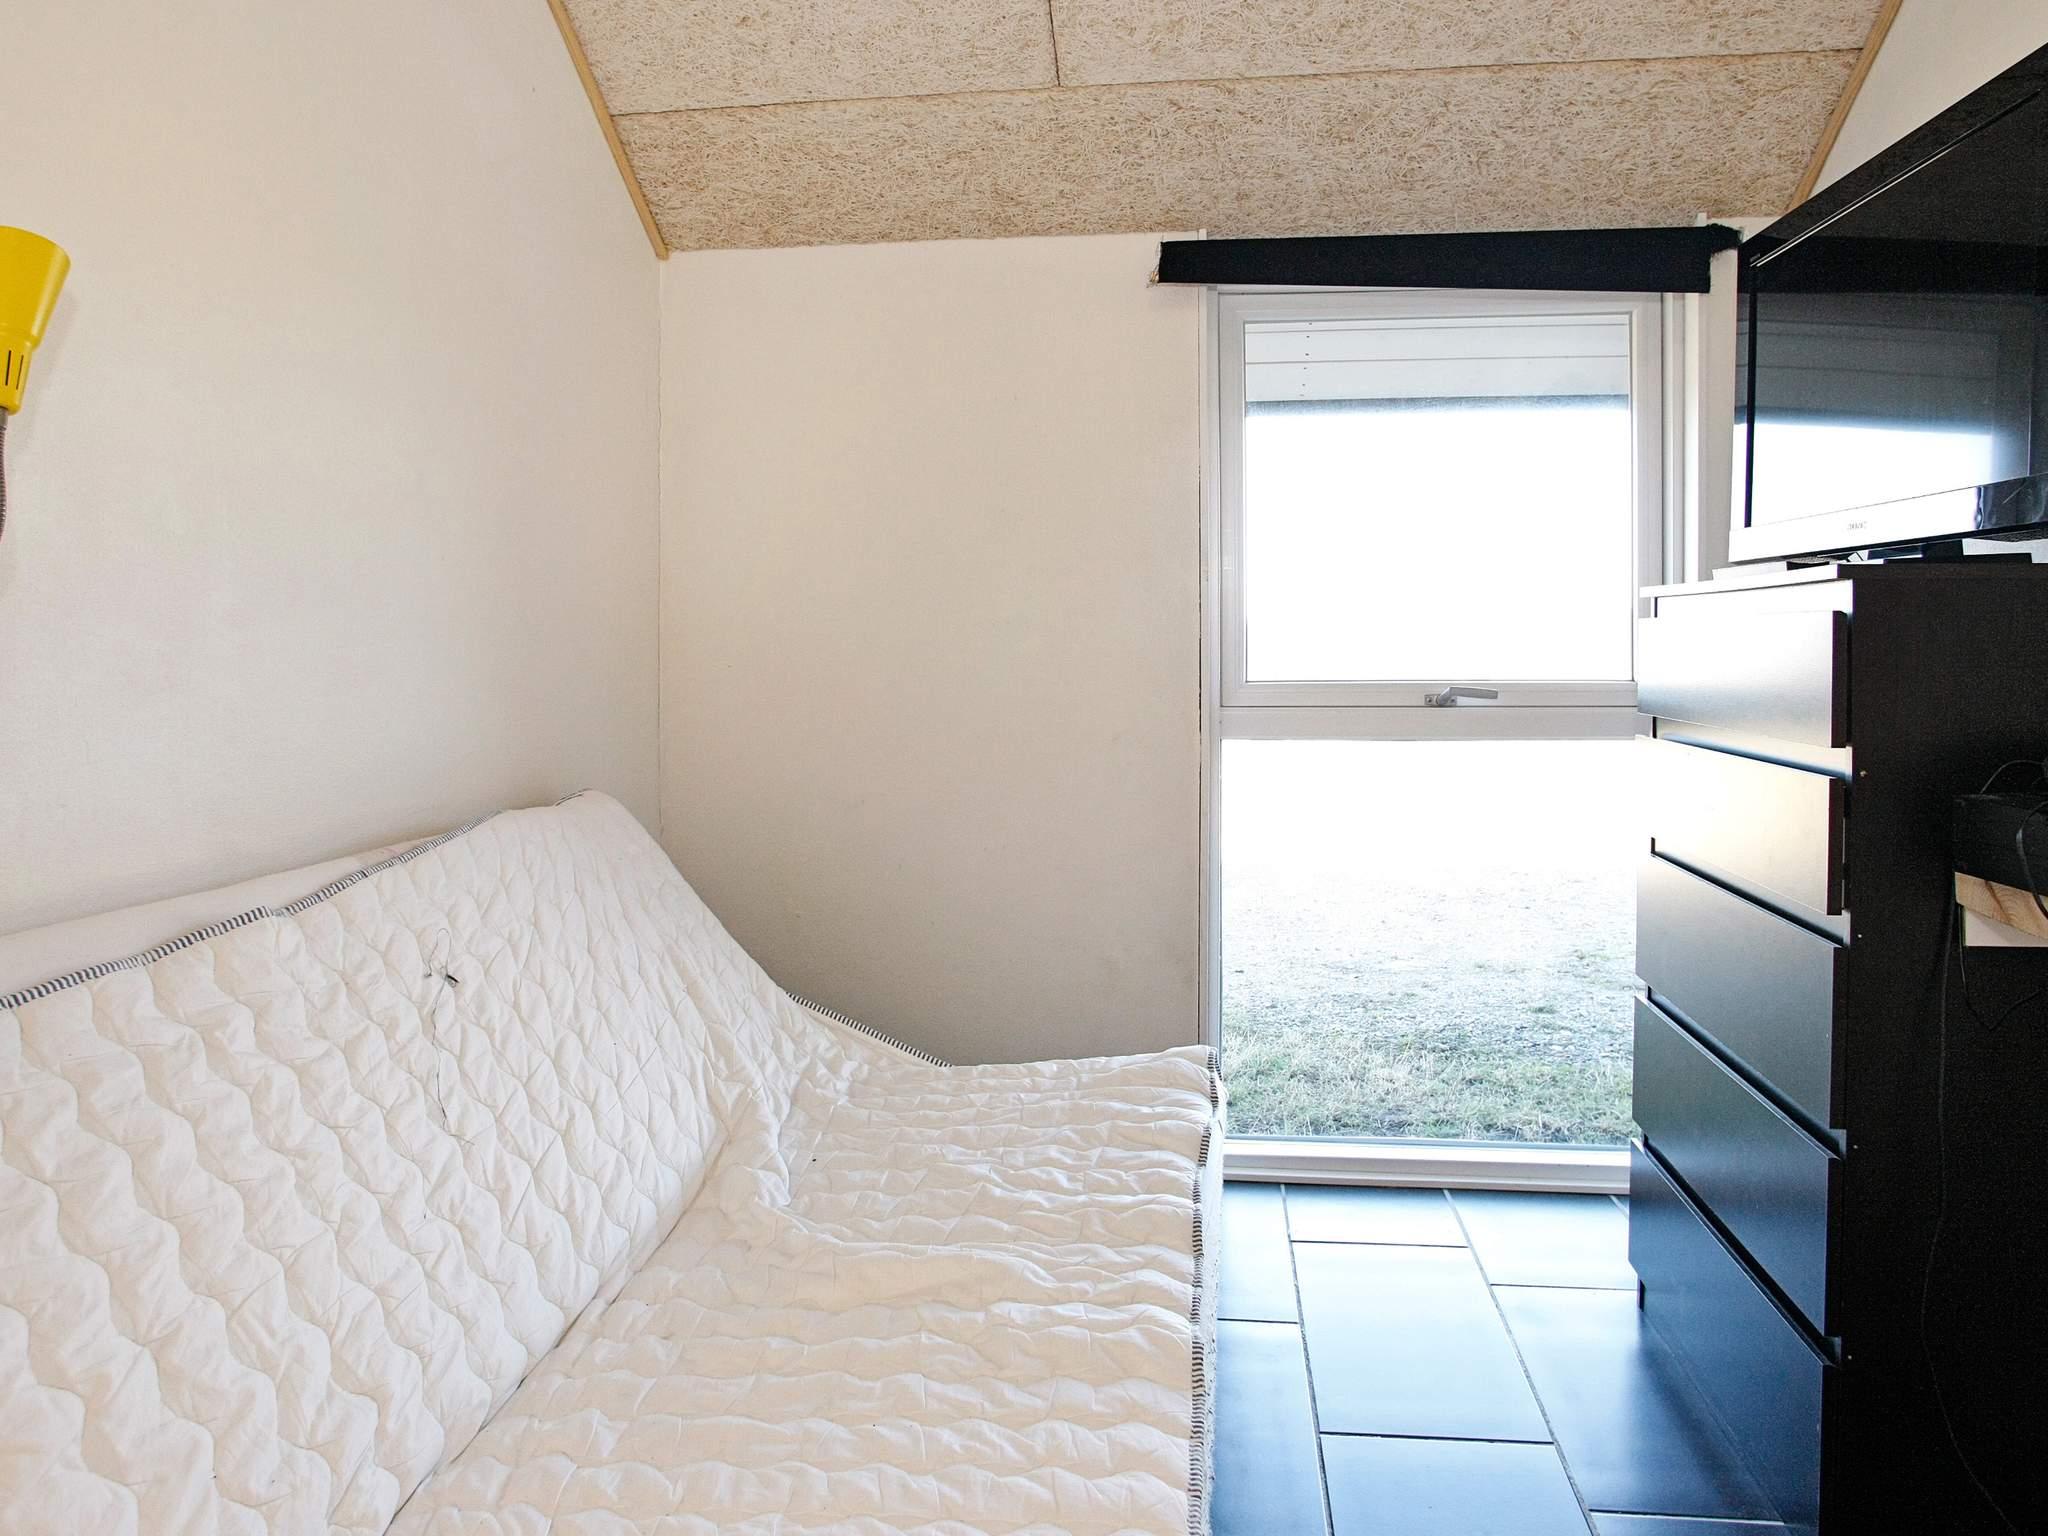 Ferienhaus Tranum Strand (424921), Tranum Enge, , Nordwestjütland, Dänemark, Bild 13